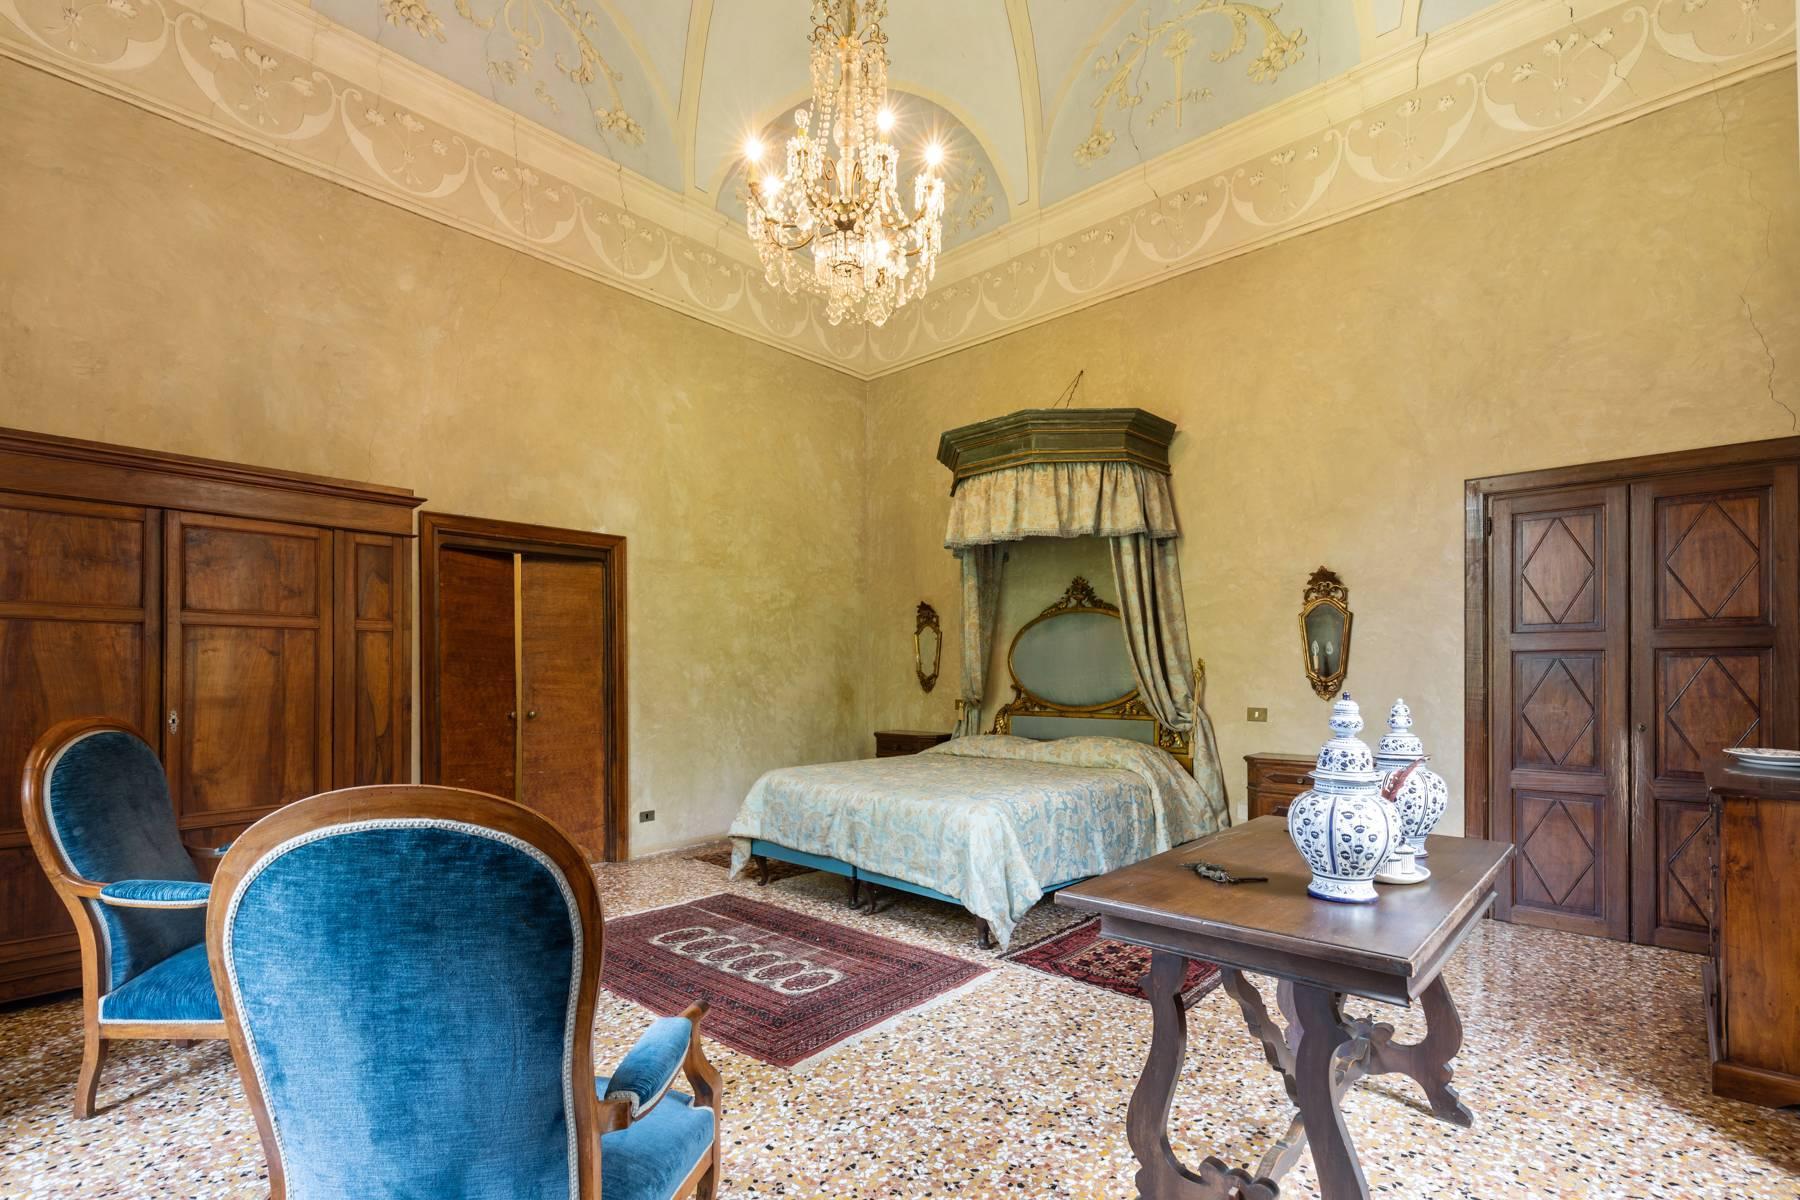 Affascinante villa Veneta a pochi minuti da Verona - 26